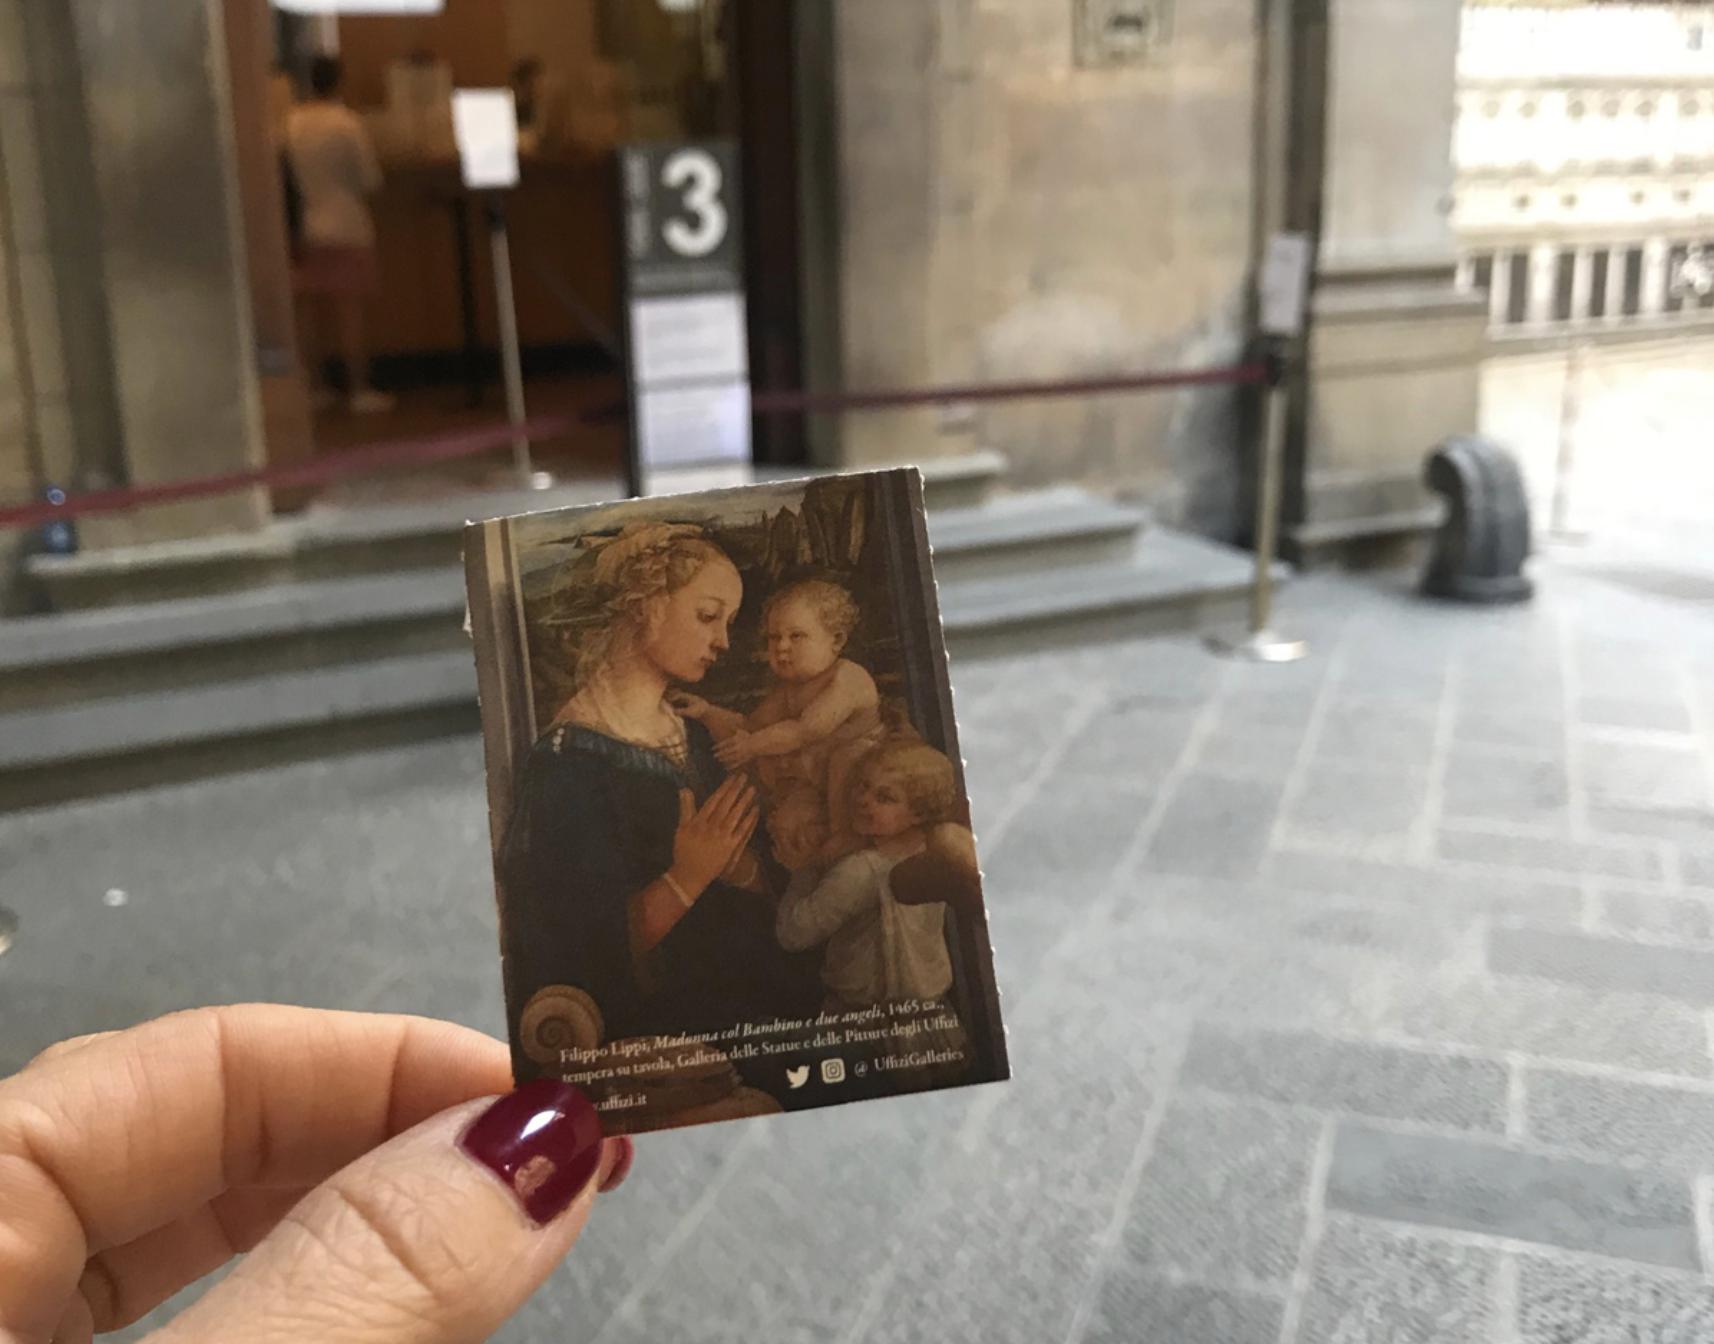 Ticket to the Uffizi Gallery